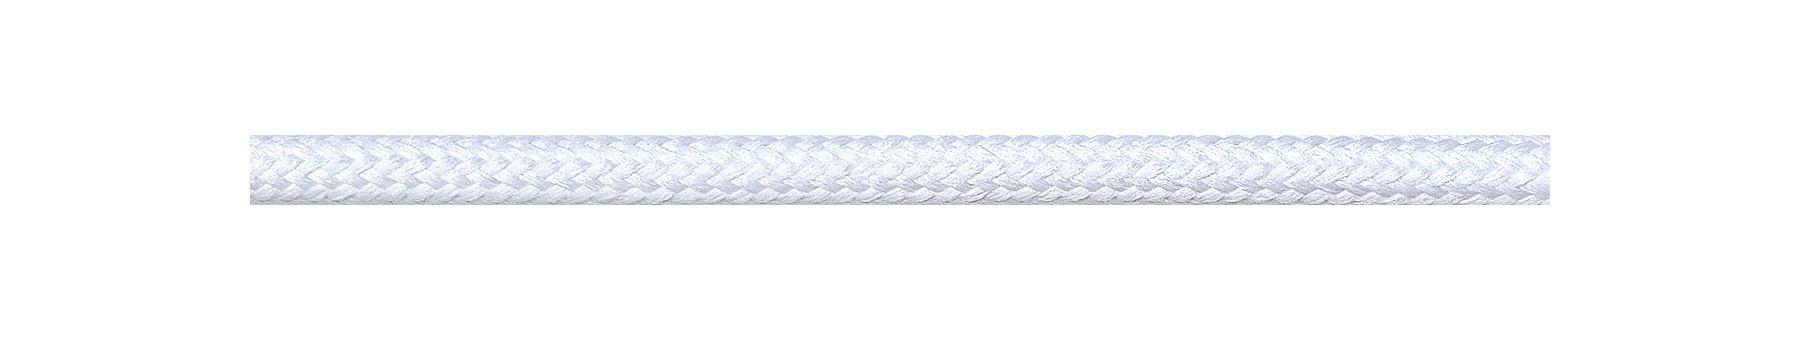 Textile Cable White